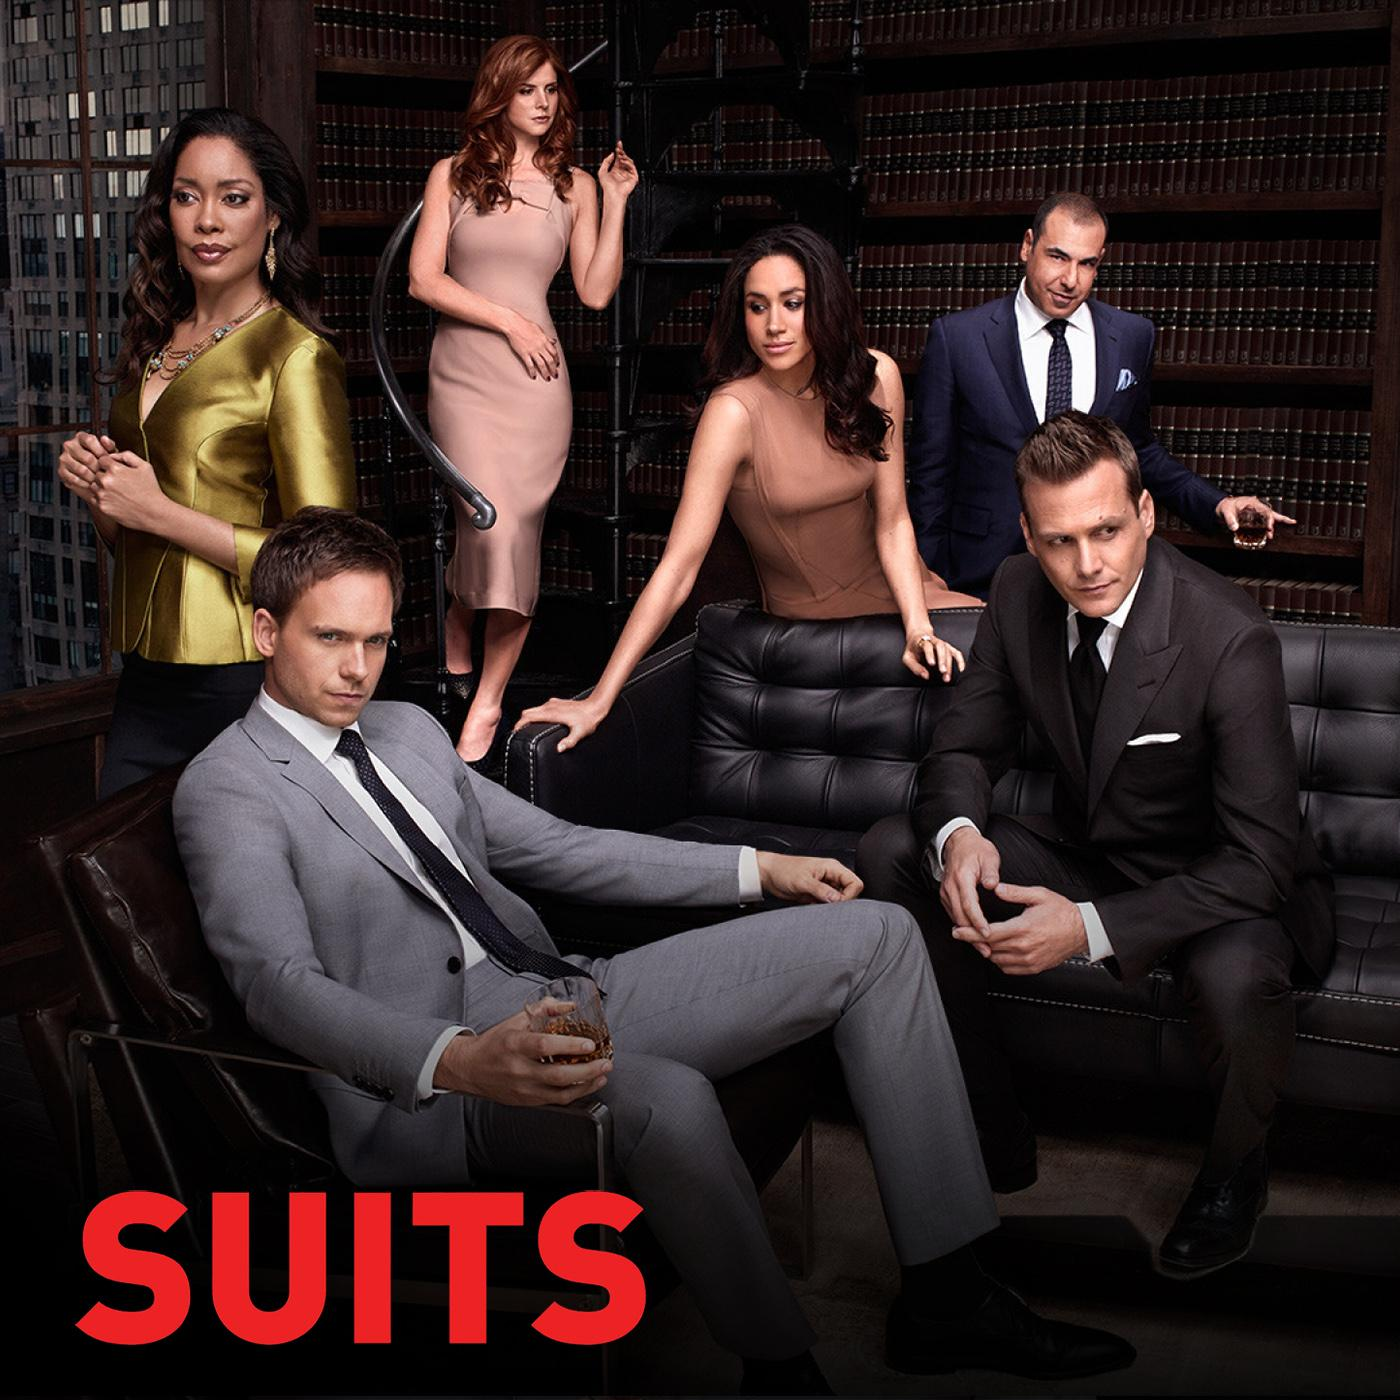 http://www.indiantelevision.com/sites/default/files/styles/smartcrop_800x800/public/images/tv-images/2016/07/12/Suits.jpg?itok=lsisyIW0